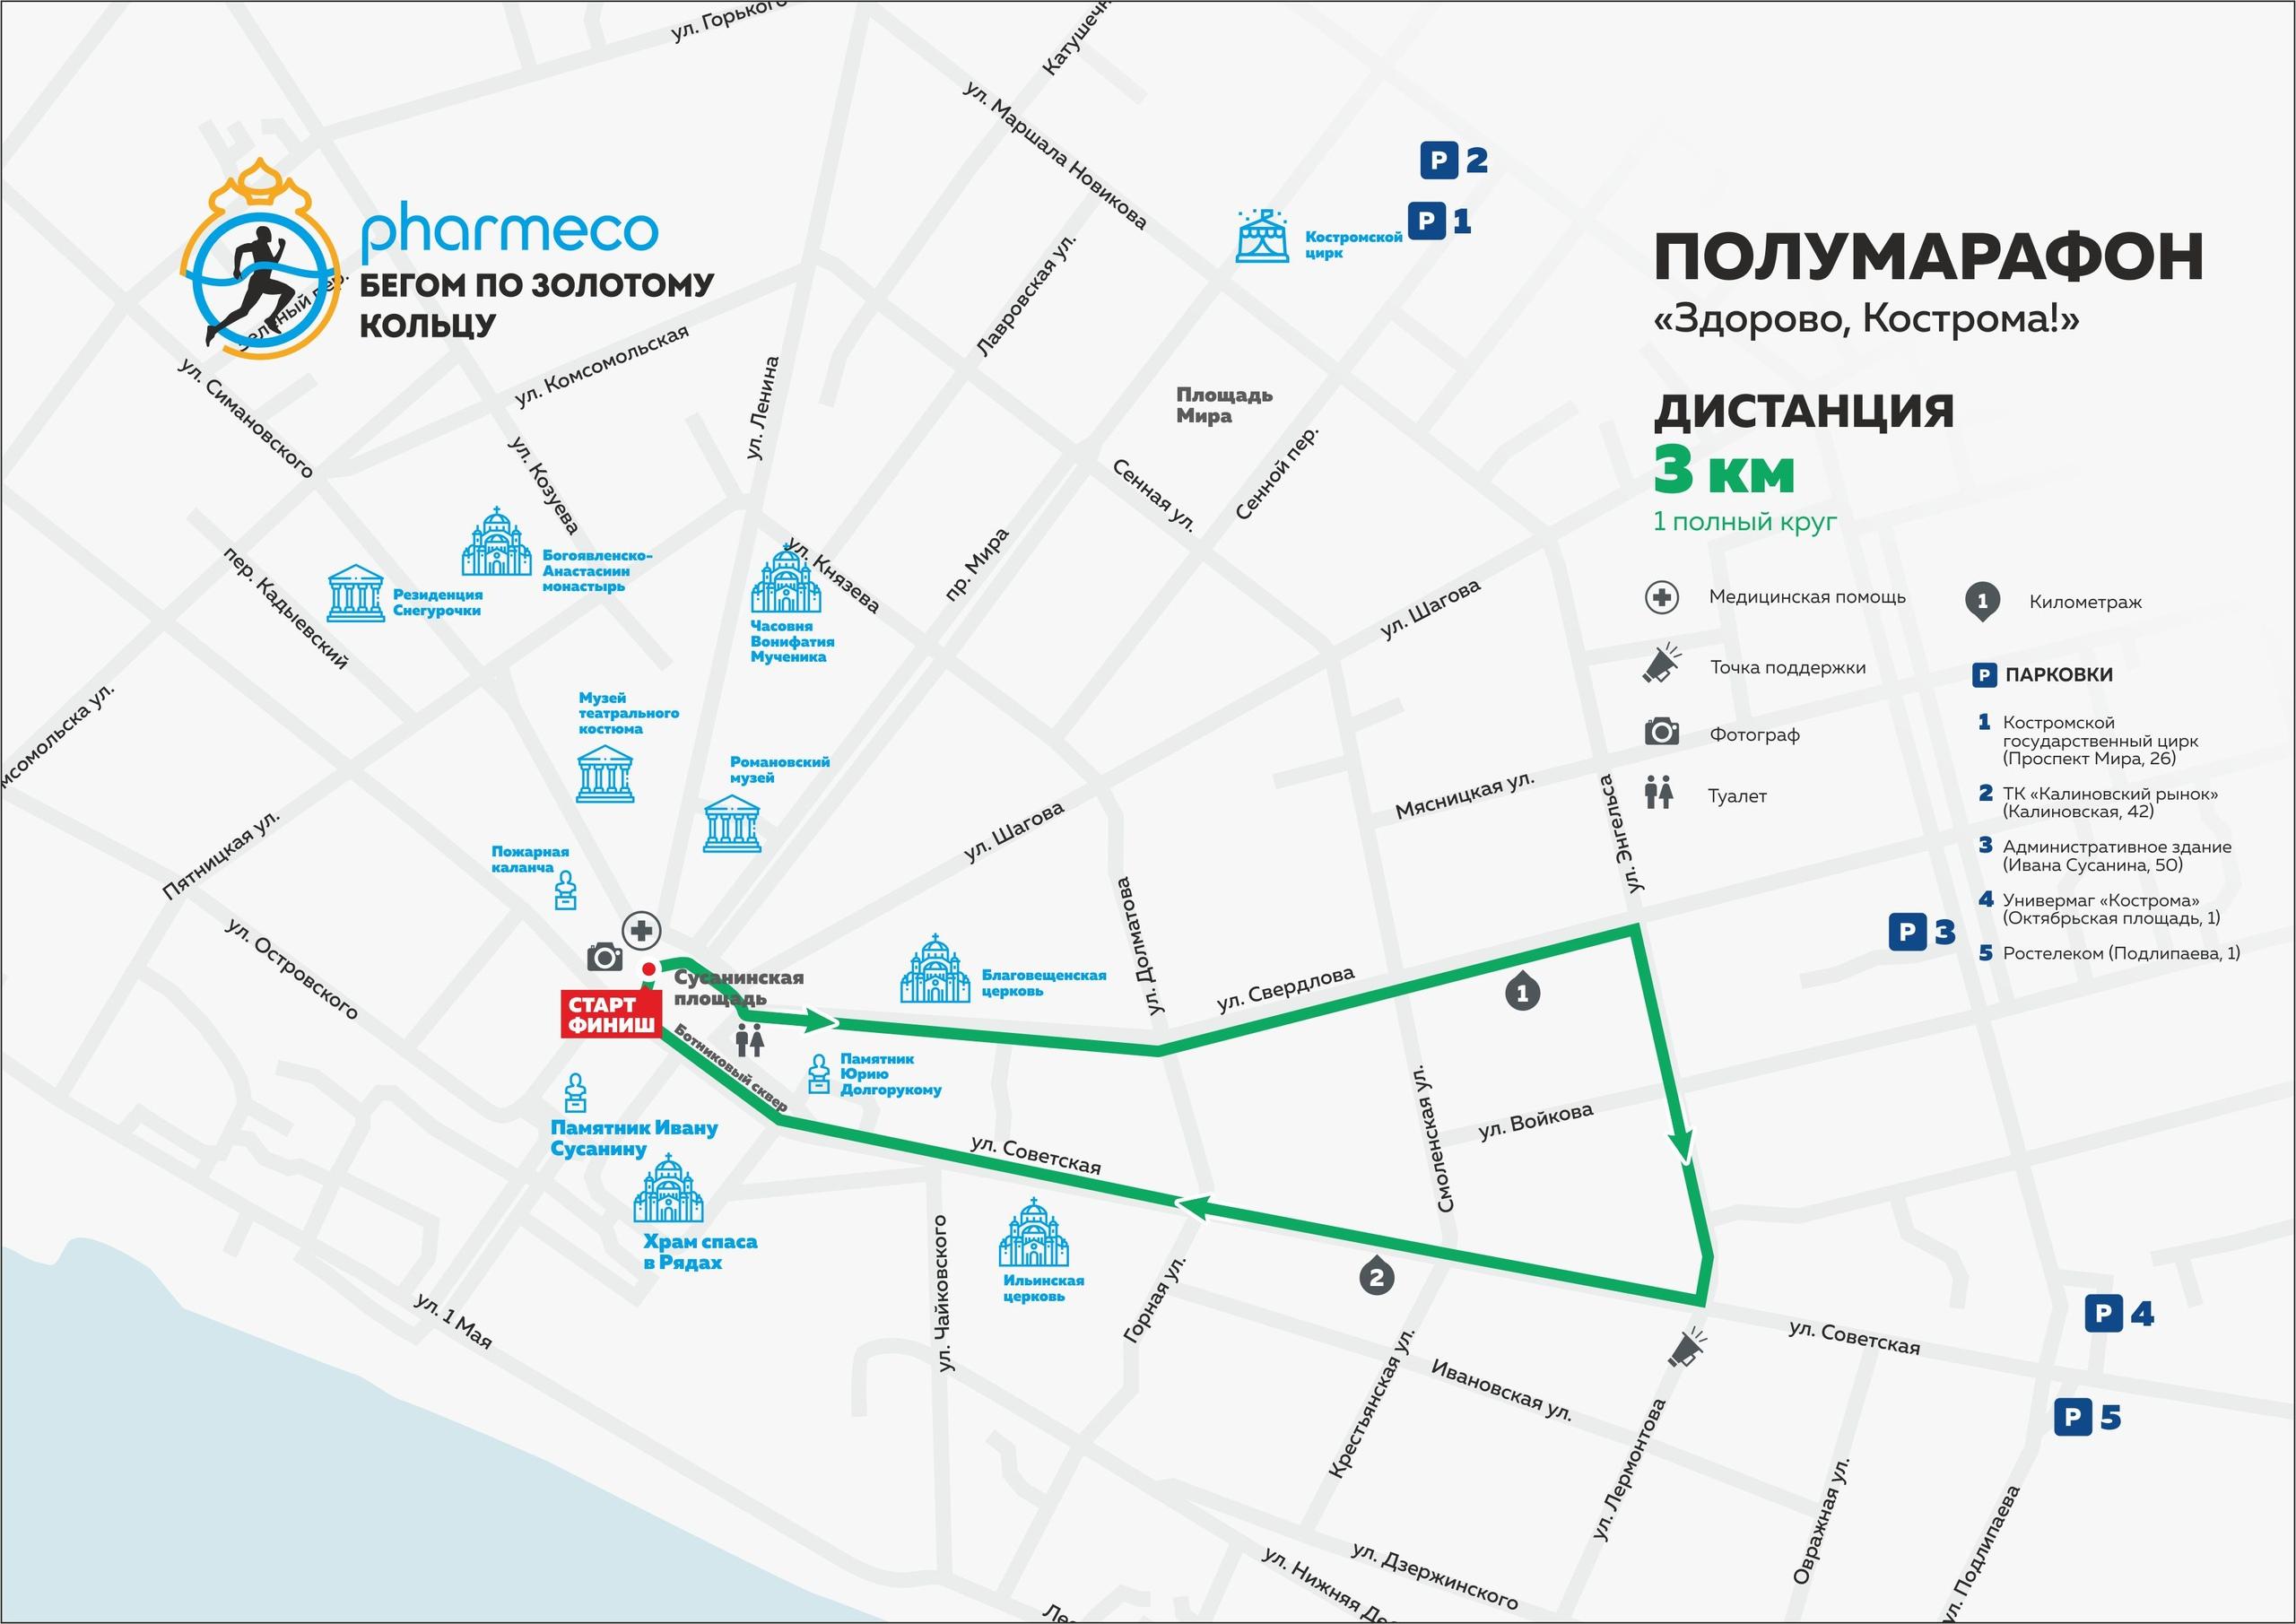 Карта дистанции 3 км Полумарафона Здорово, Кострома 2019